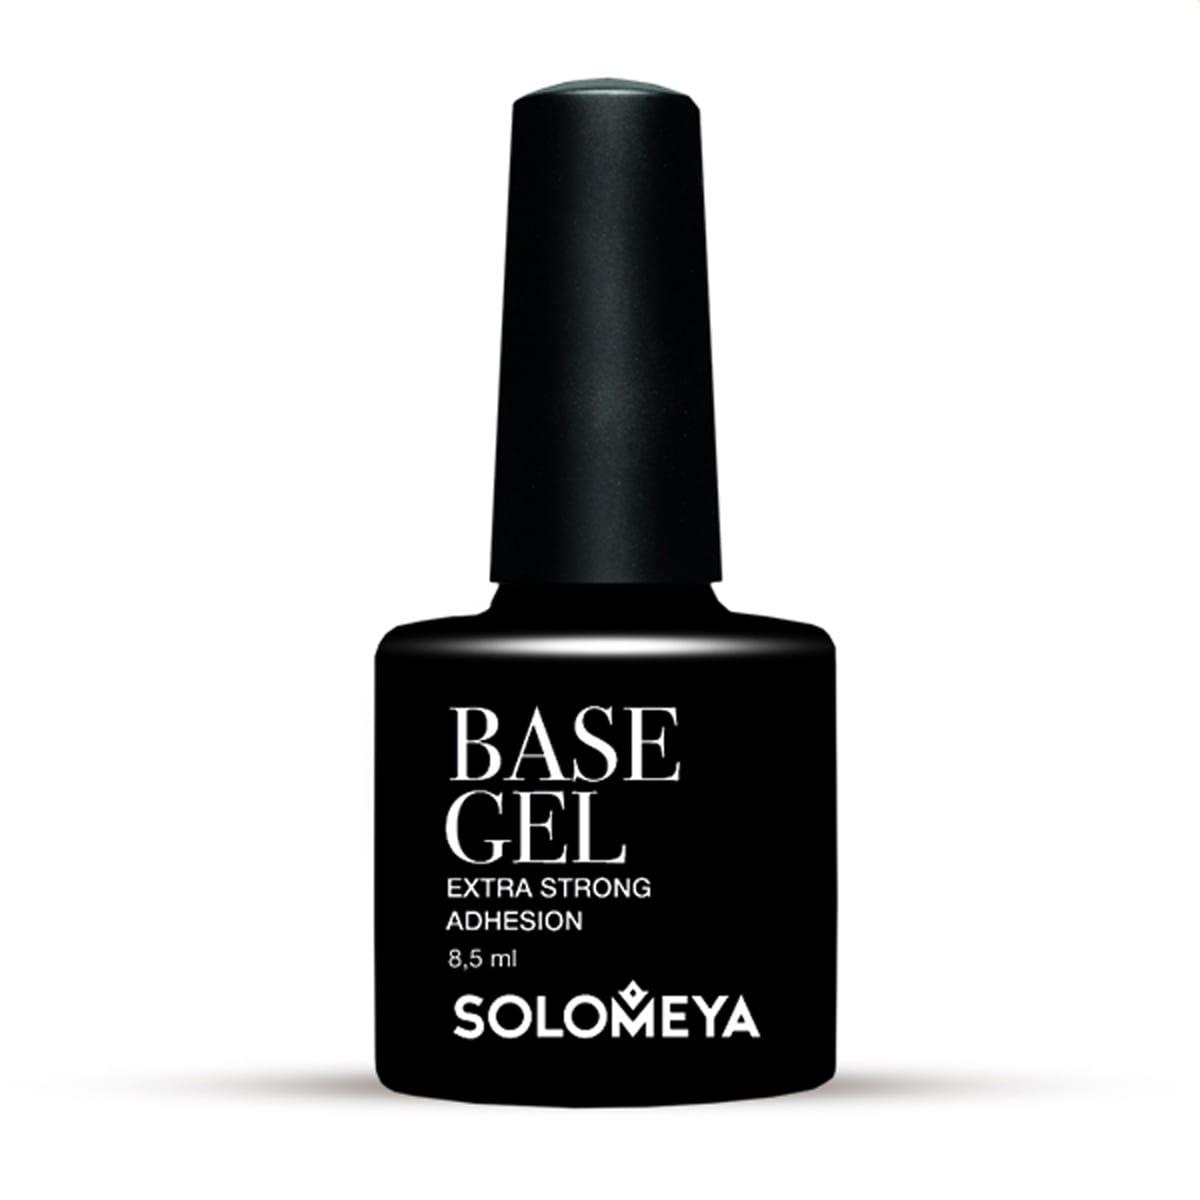 SOLOMEYA Гель базовый / Base Gel SBG 8,5 мл - Базовые покрытия